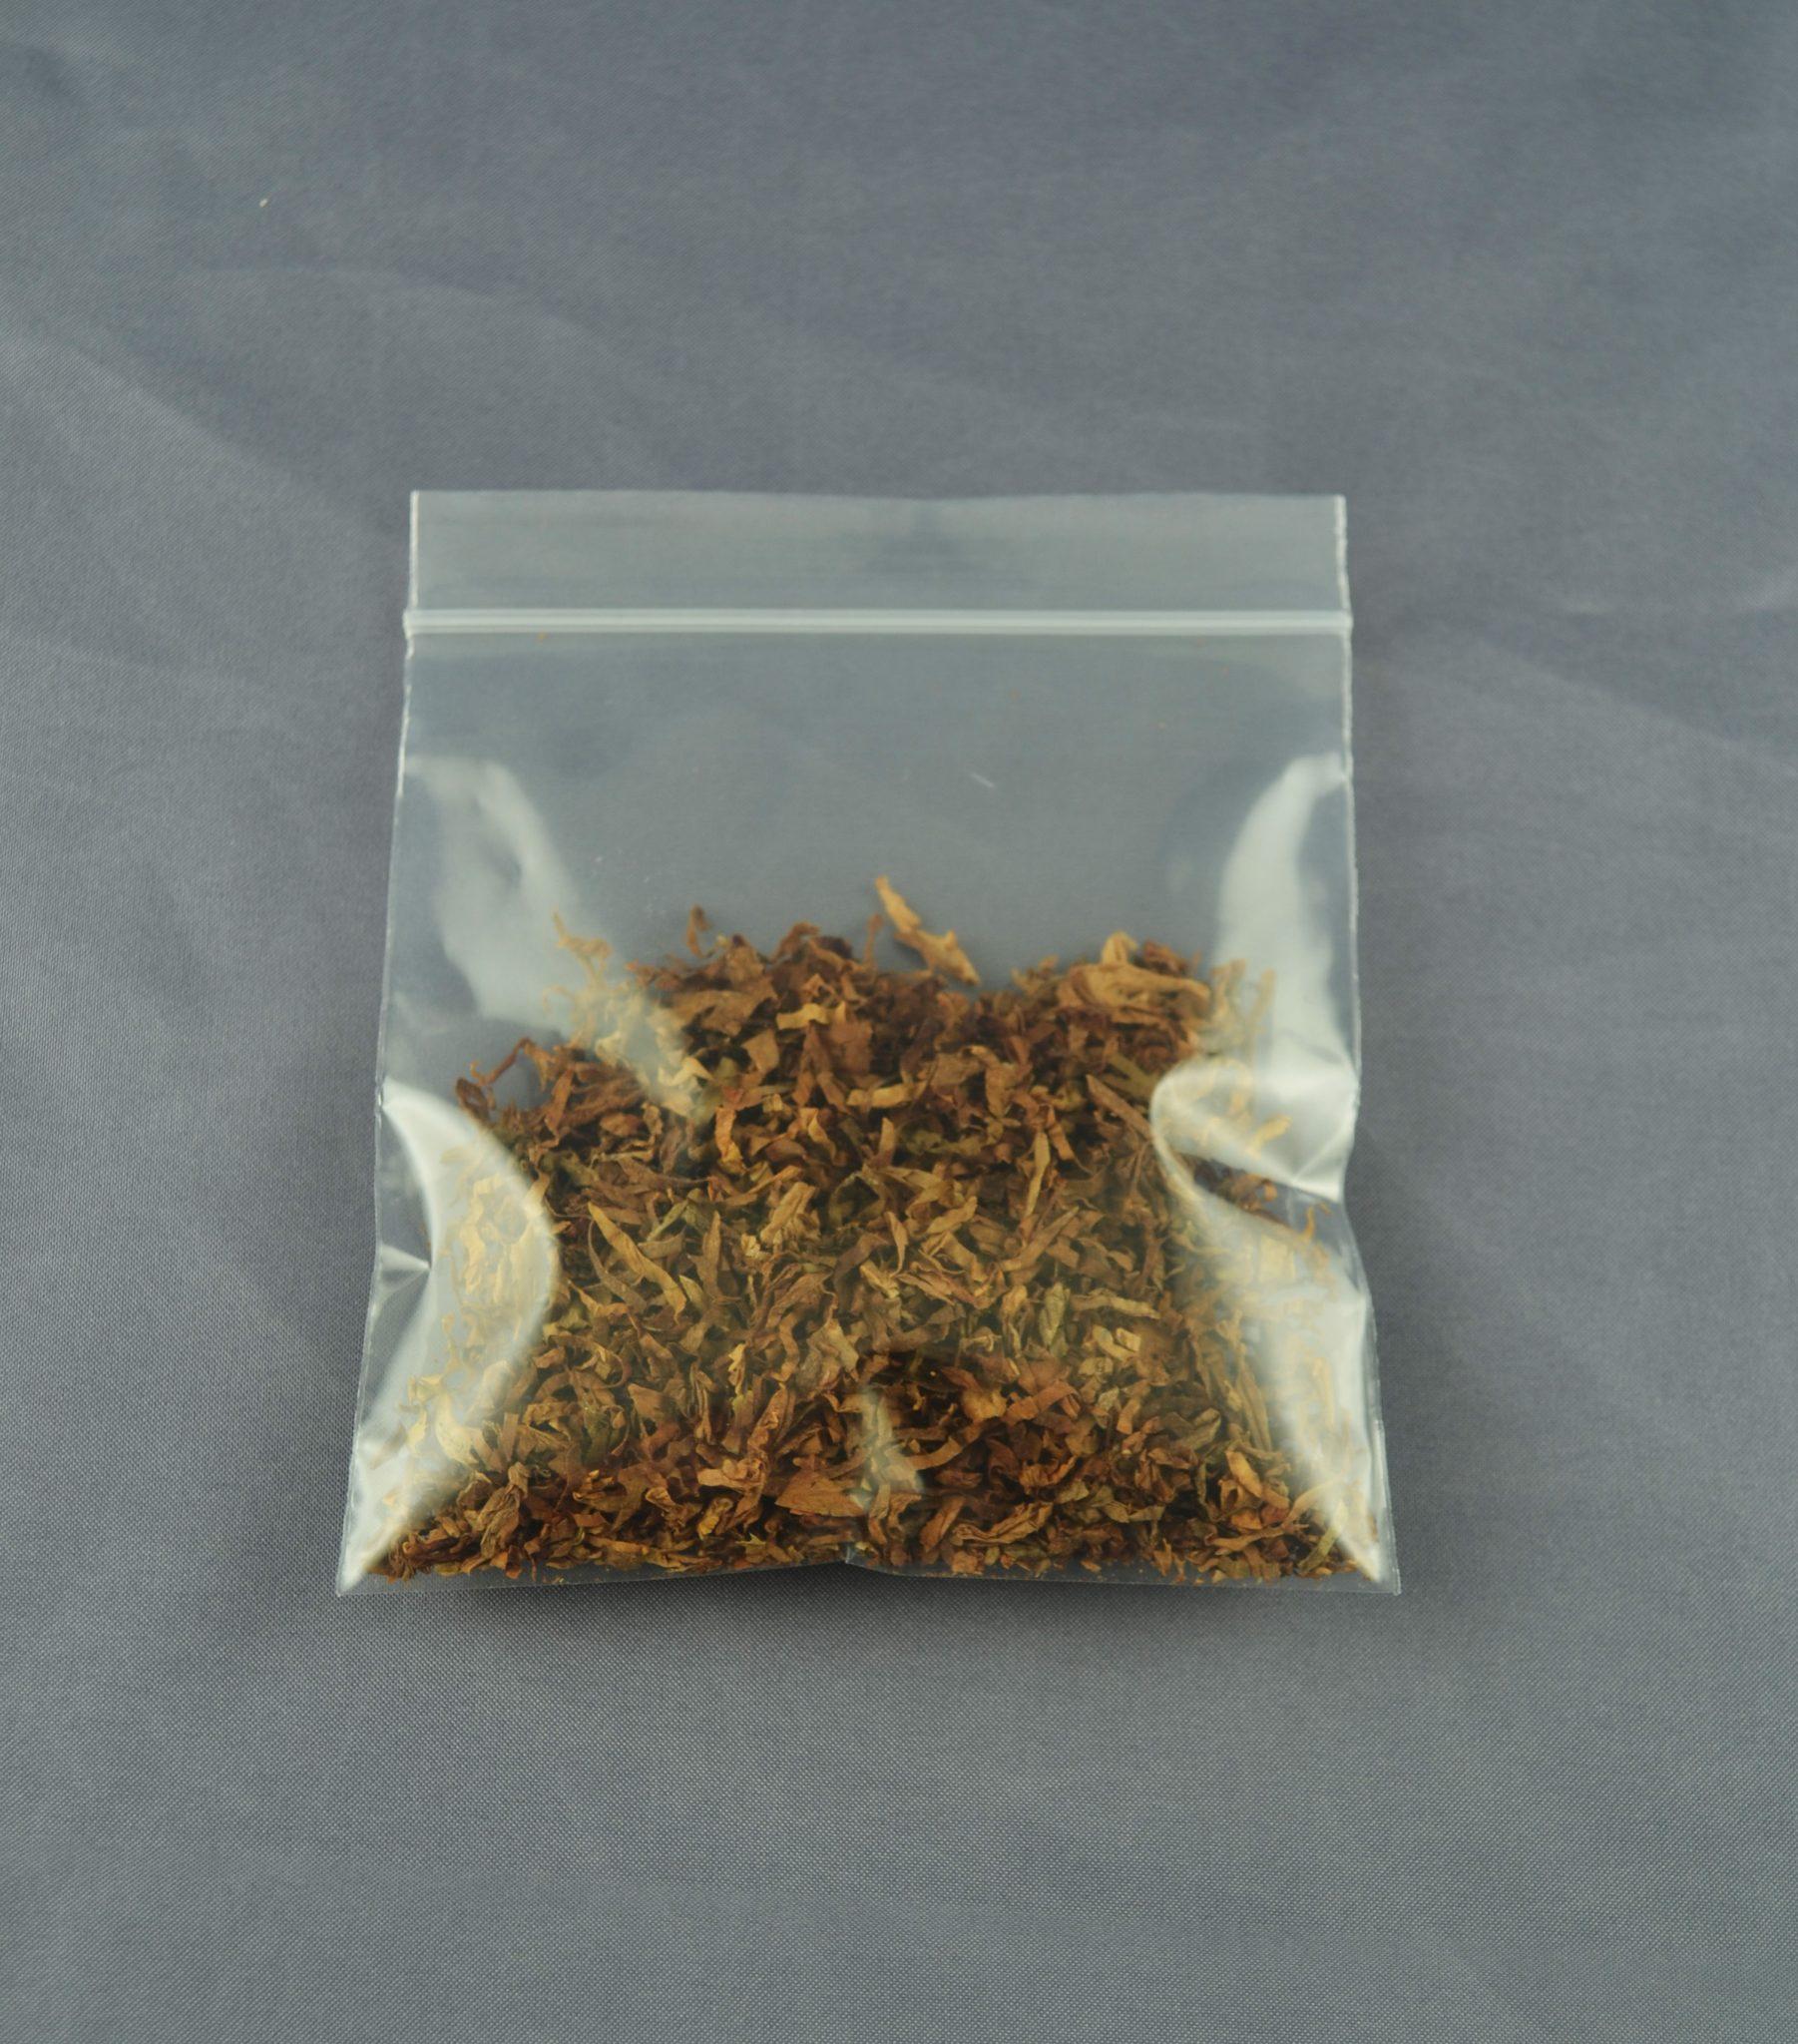 Reclosable Zip Bag 4 MIL